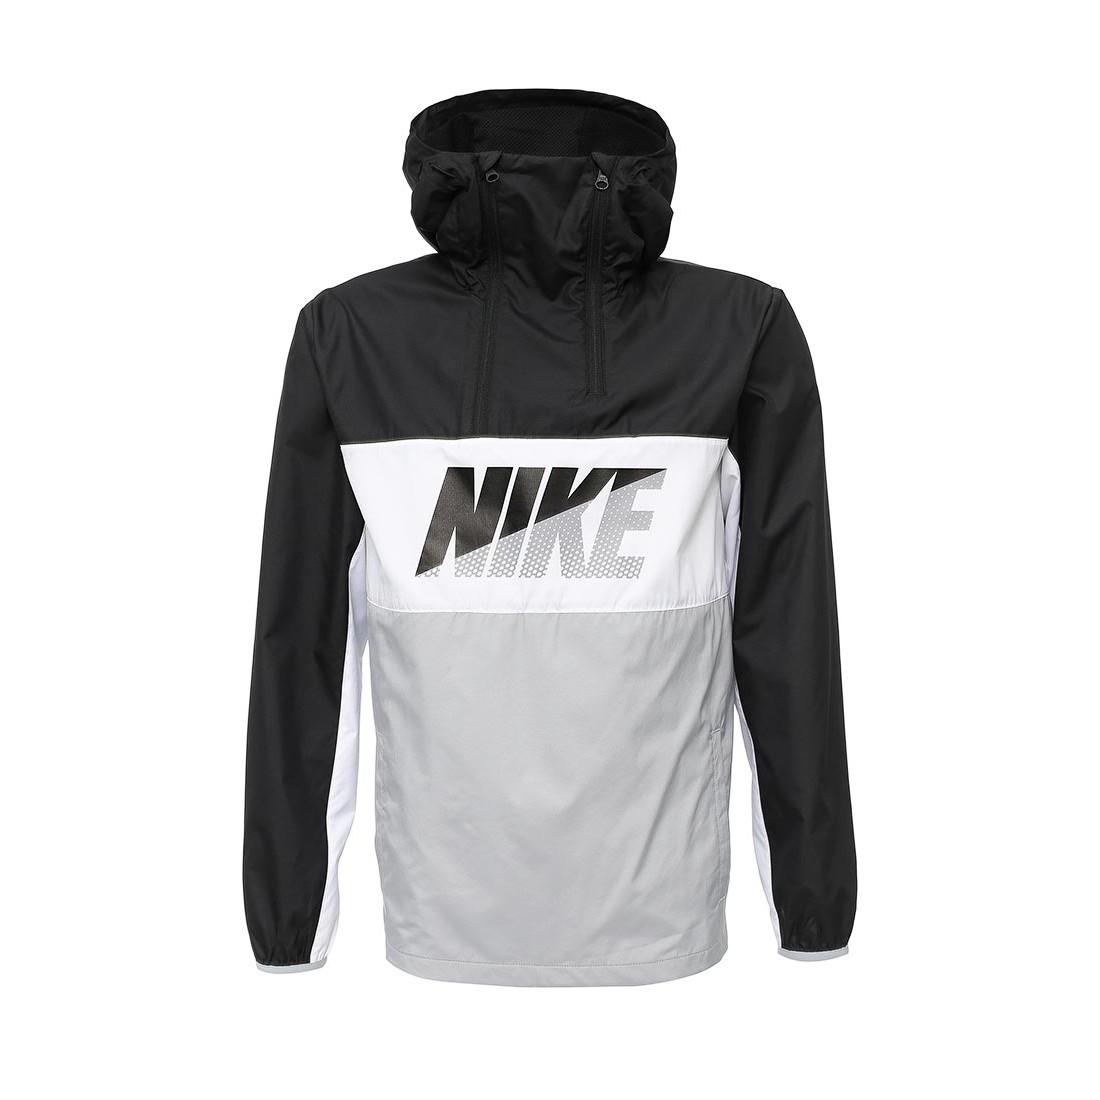 Мужская легкая Ветровка NIKE HALFZIP JACKET Nike MP002XM0VMP3 по акции. 09eeeaec9520b